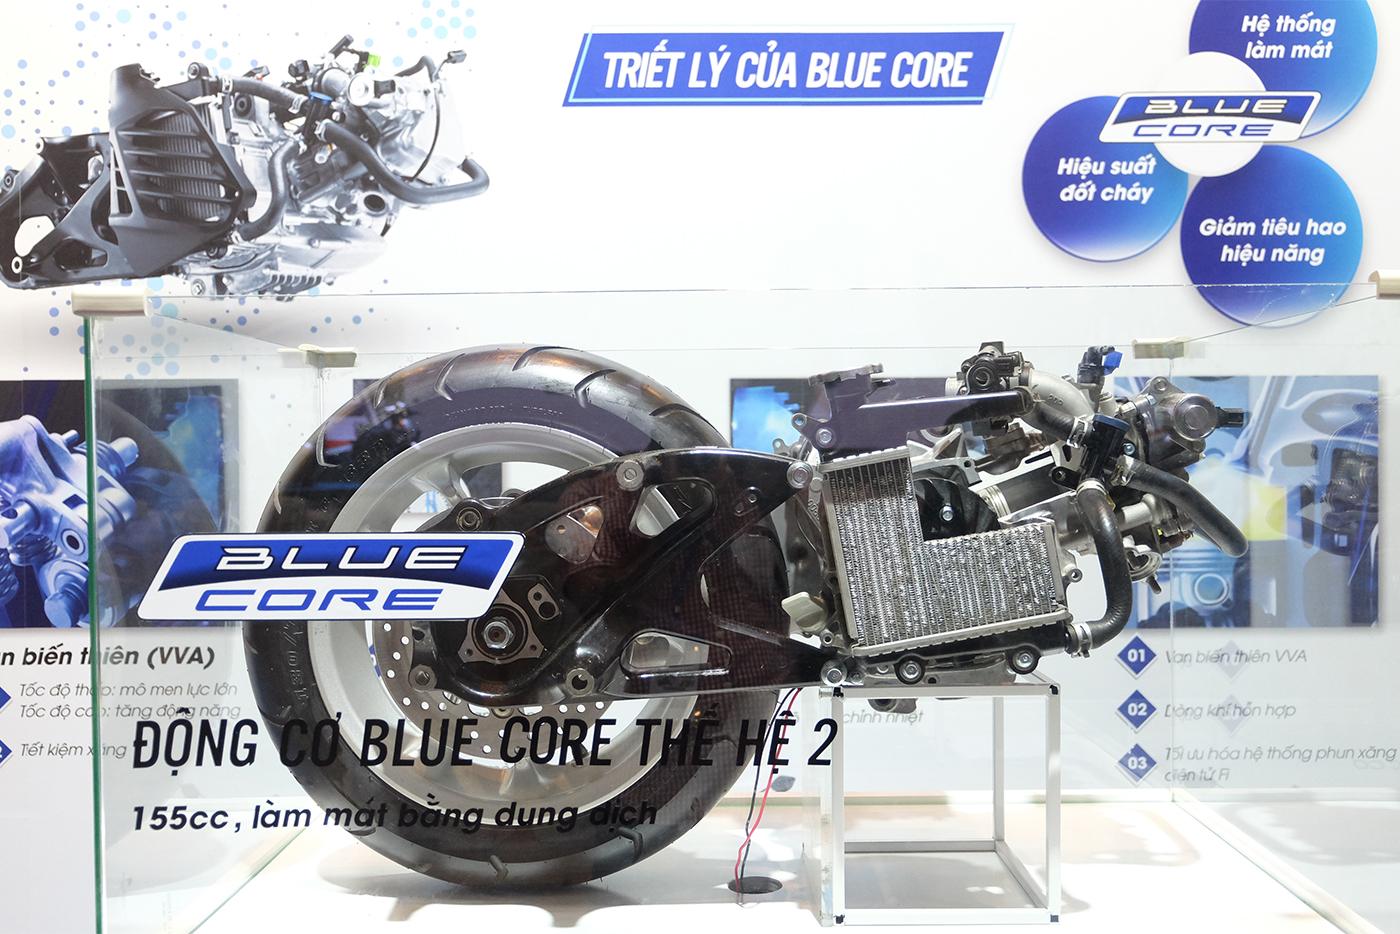 yamaha-motor-viet-nam-ky-niem-5-nam-dong-co-blue-core-va-hanh-trinh-asean-blue-core-touring-6.JPG